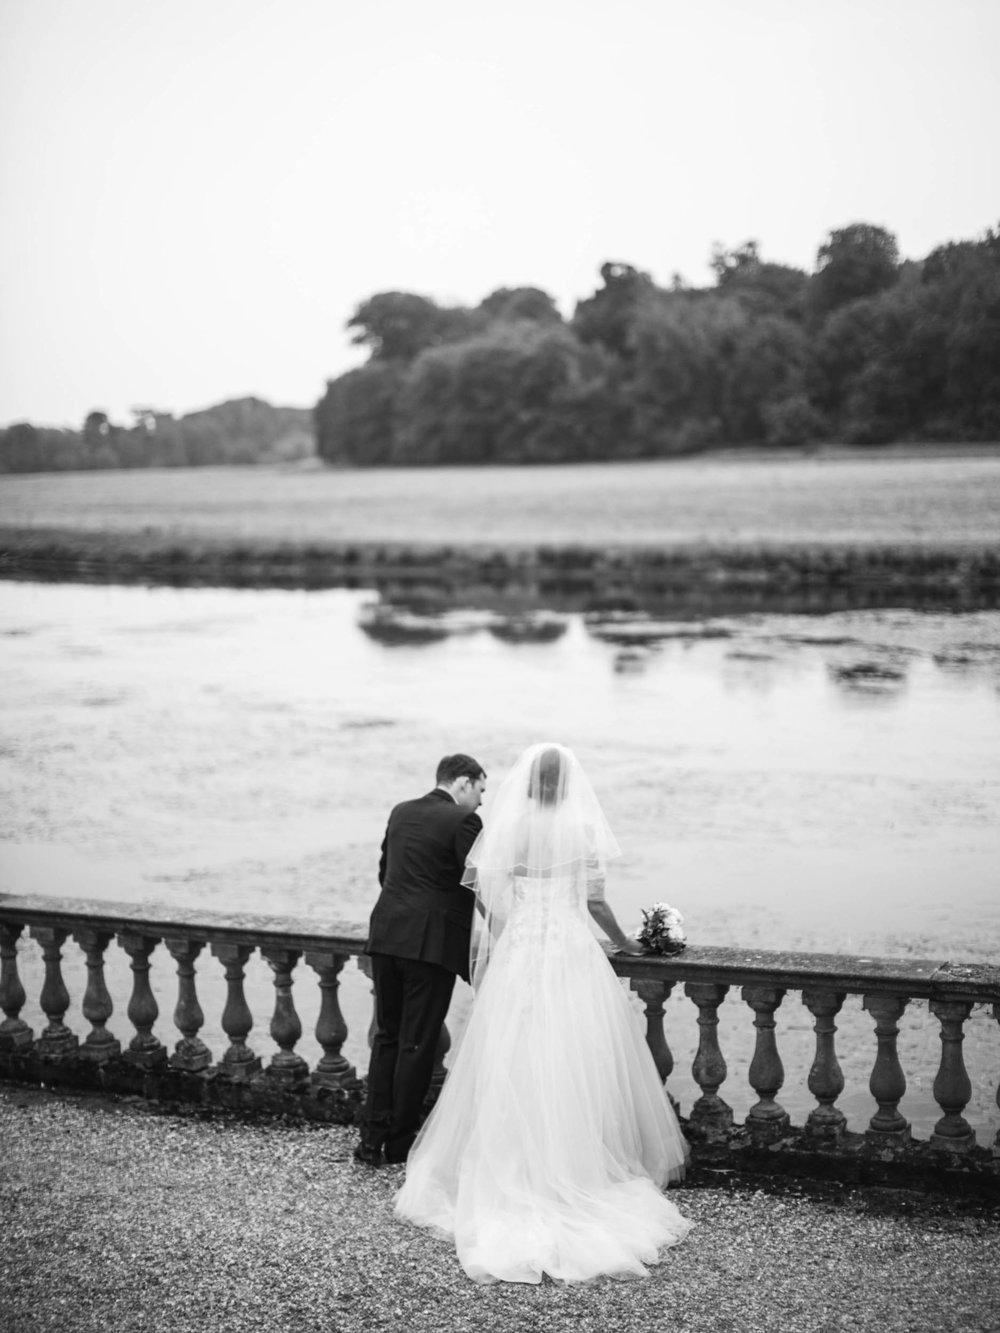 Amy O'Boyle Photography- Destination & UK Fine Art Film Wedding Photographer- Stoneleigh Abbey Wedding-54.jpg